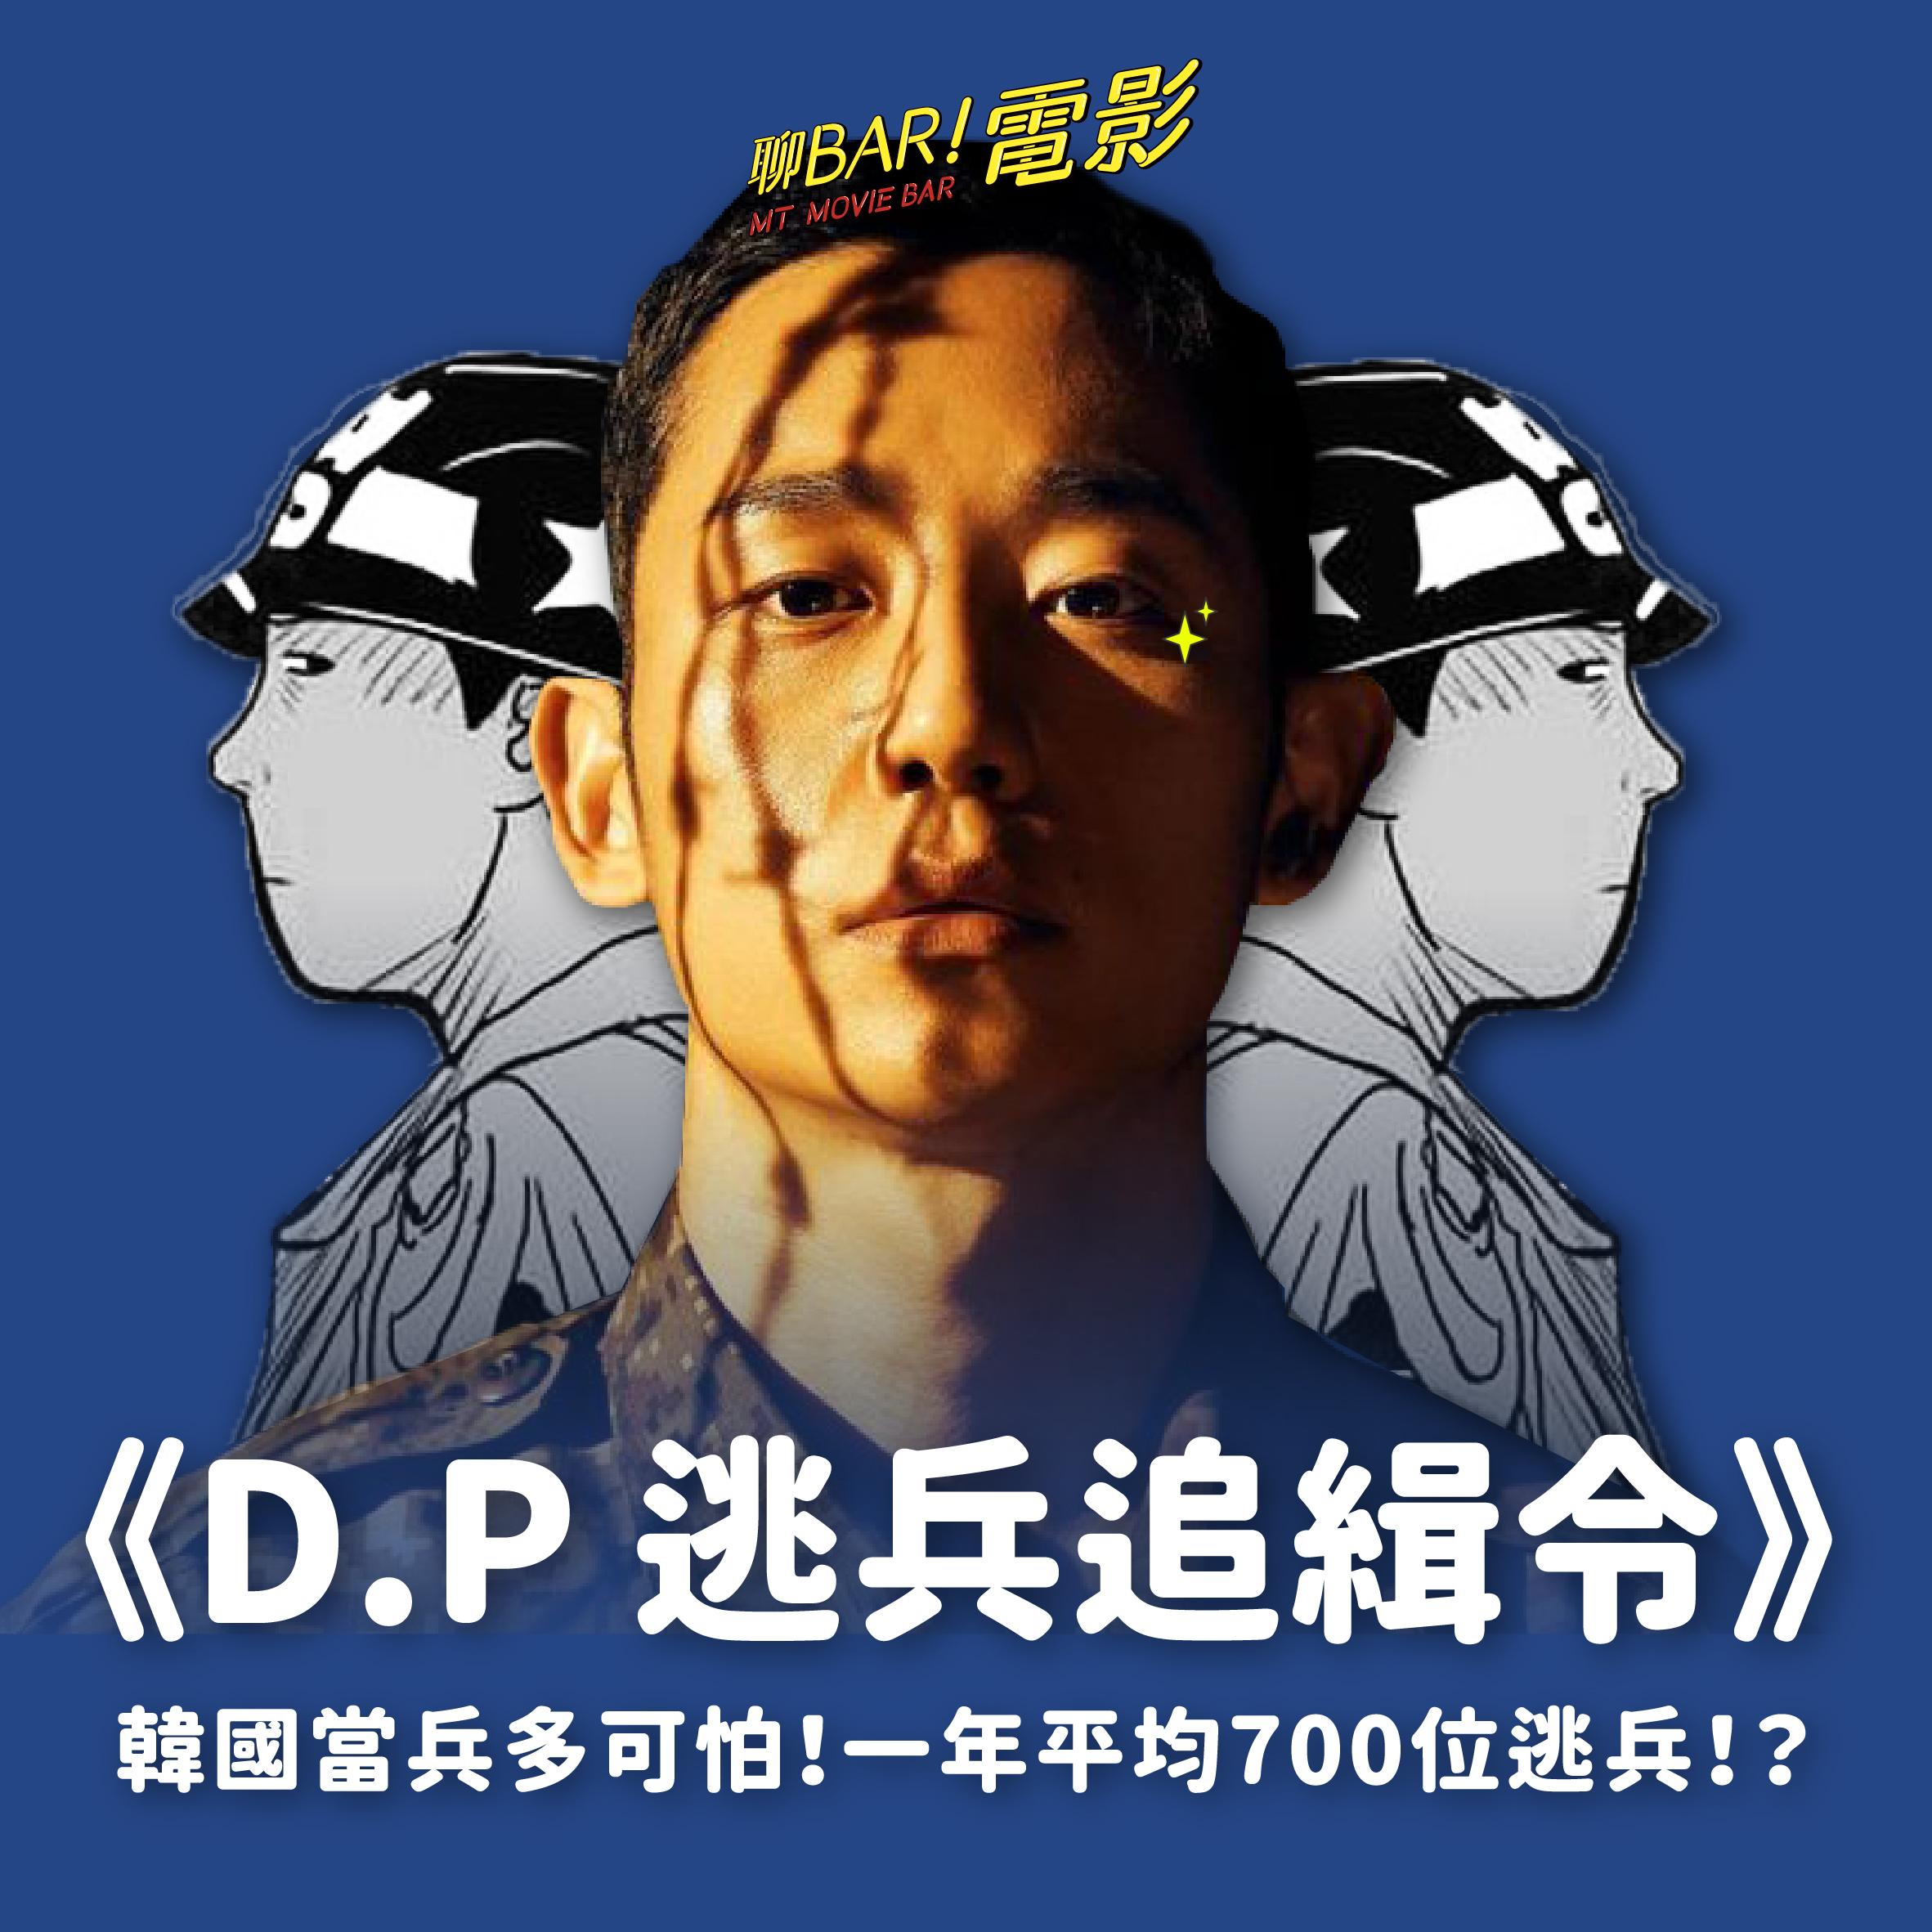 《D.P 逃兵追緝令》韓國當兵多可怕!一年平均700位逃兵!?